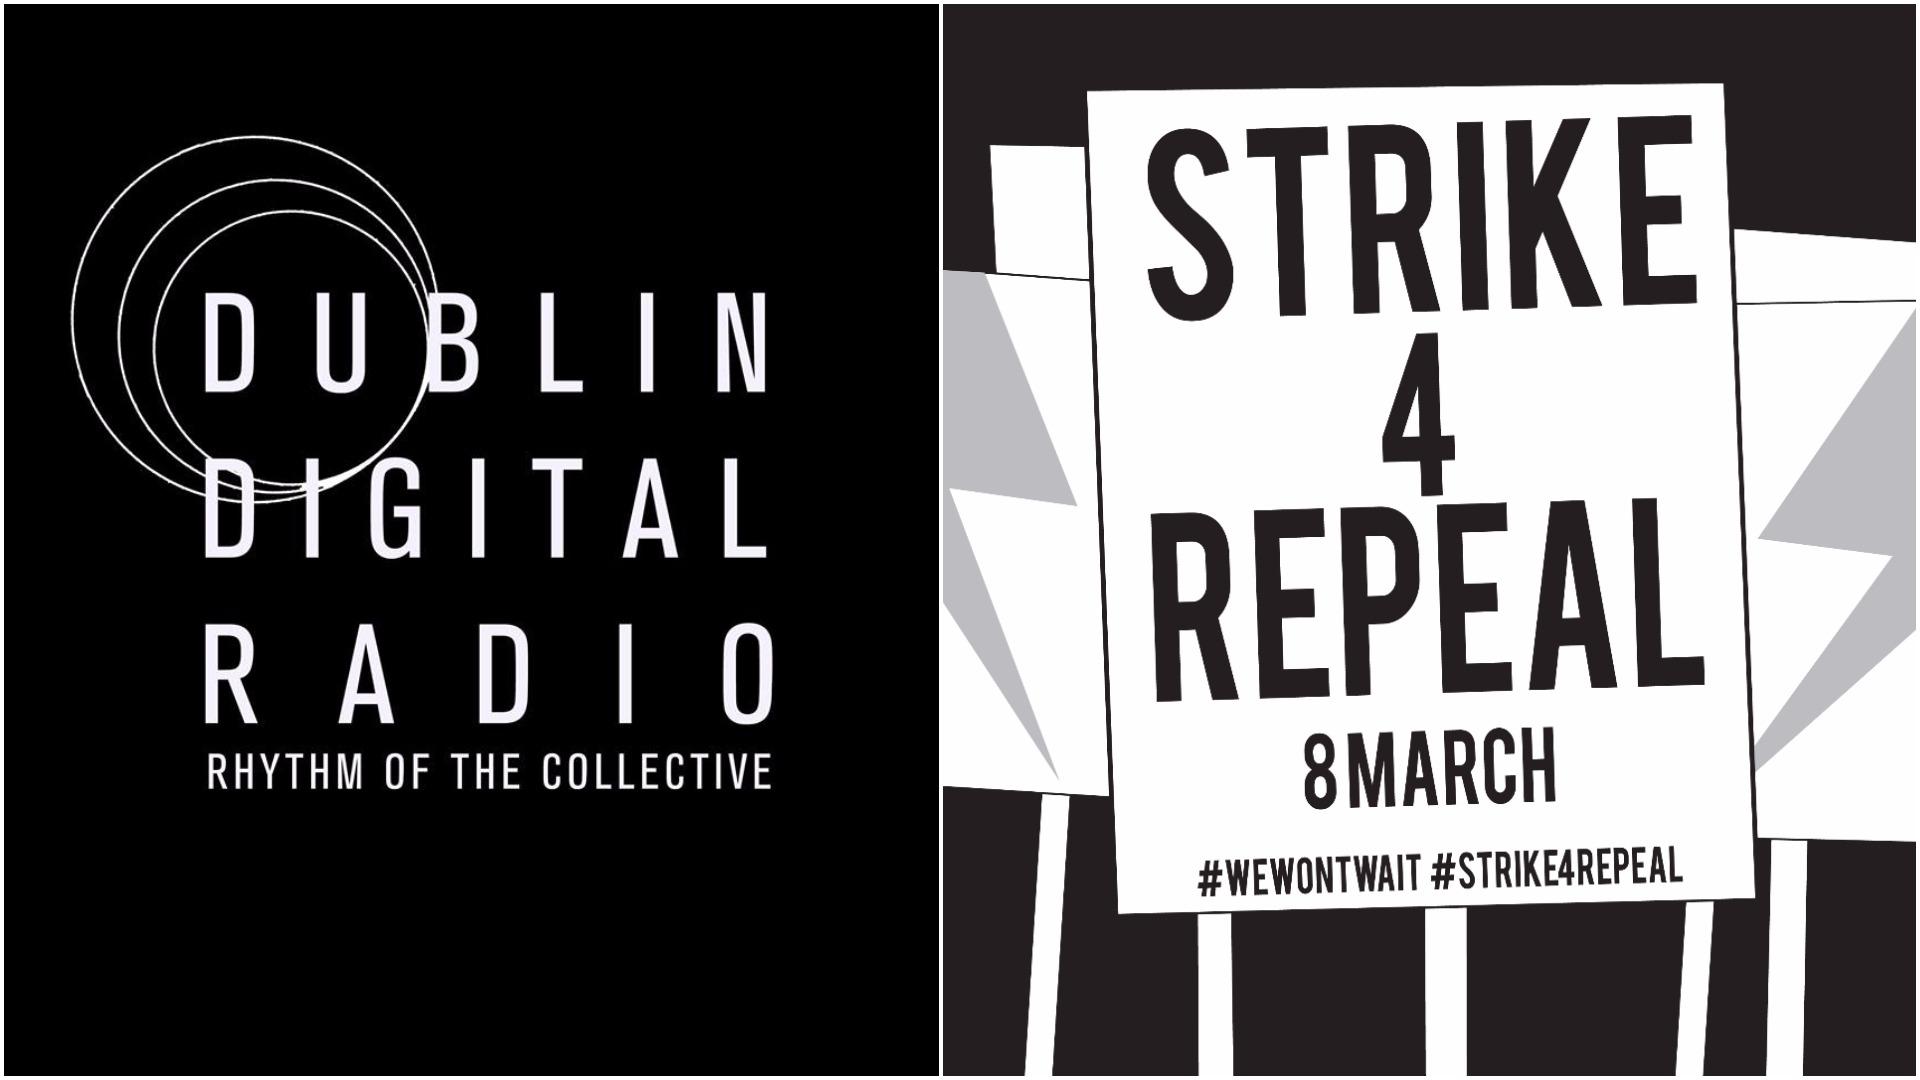 Dudlin Digital Radio & Strike 4 Repeal logos